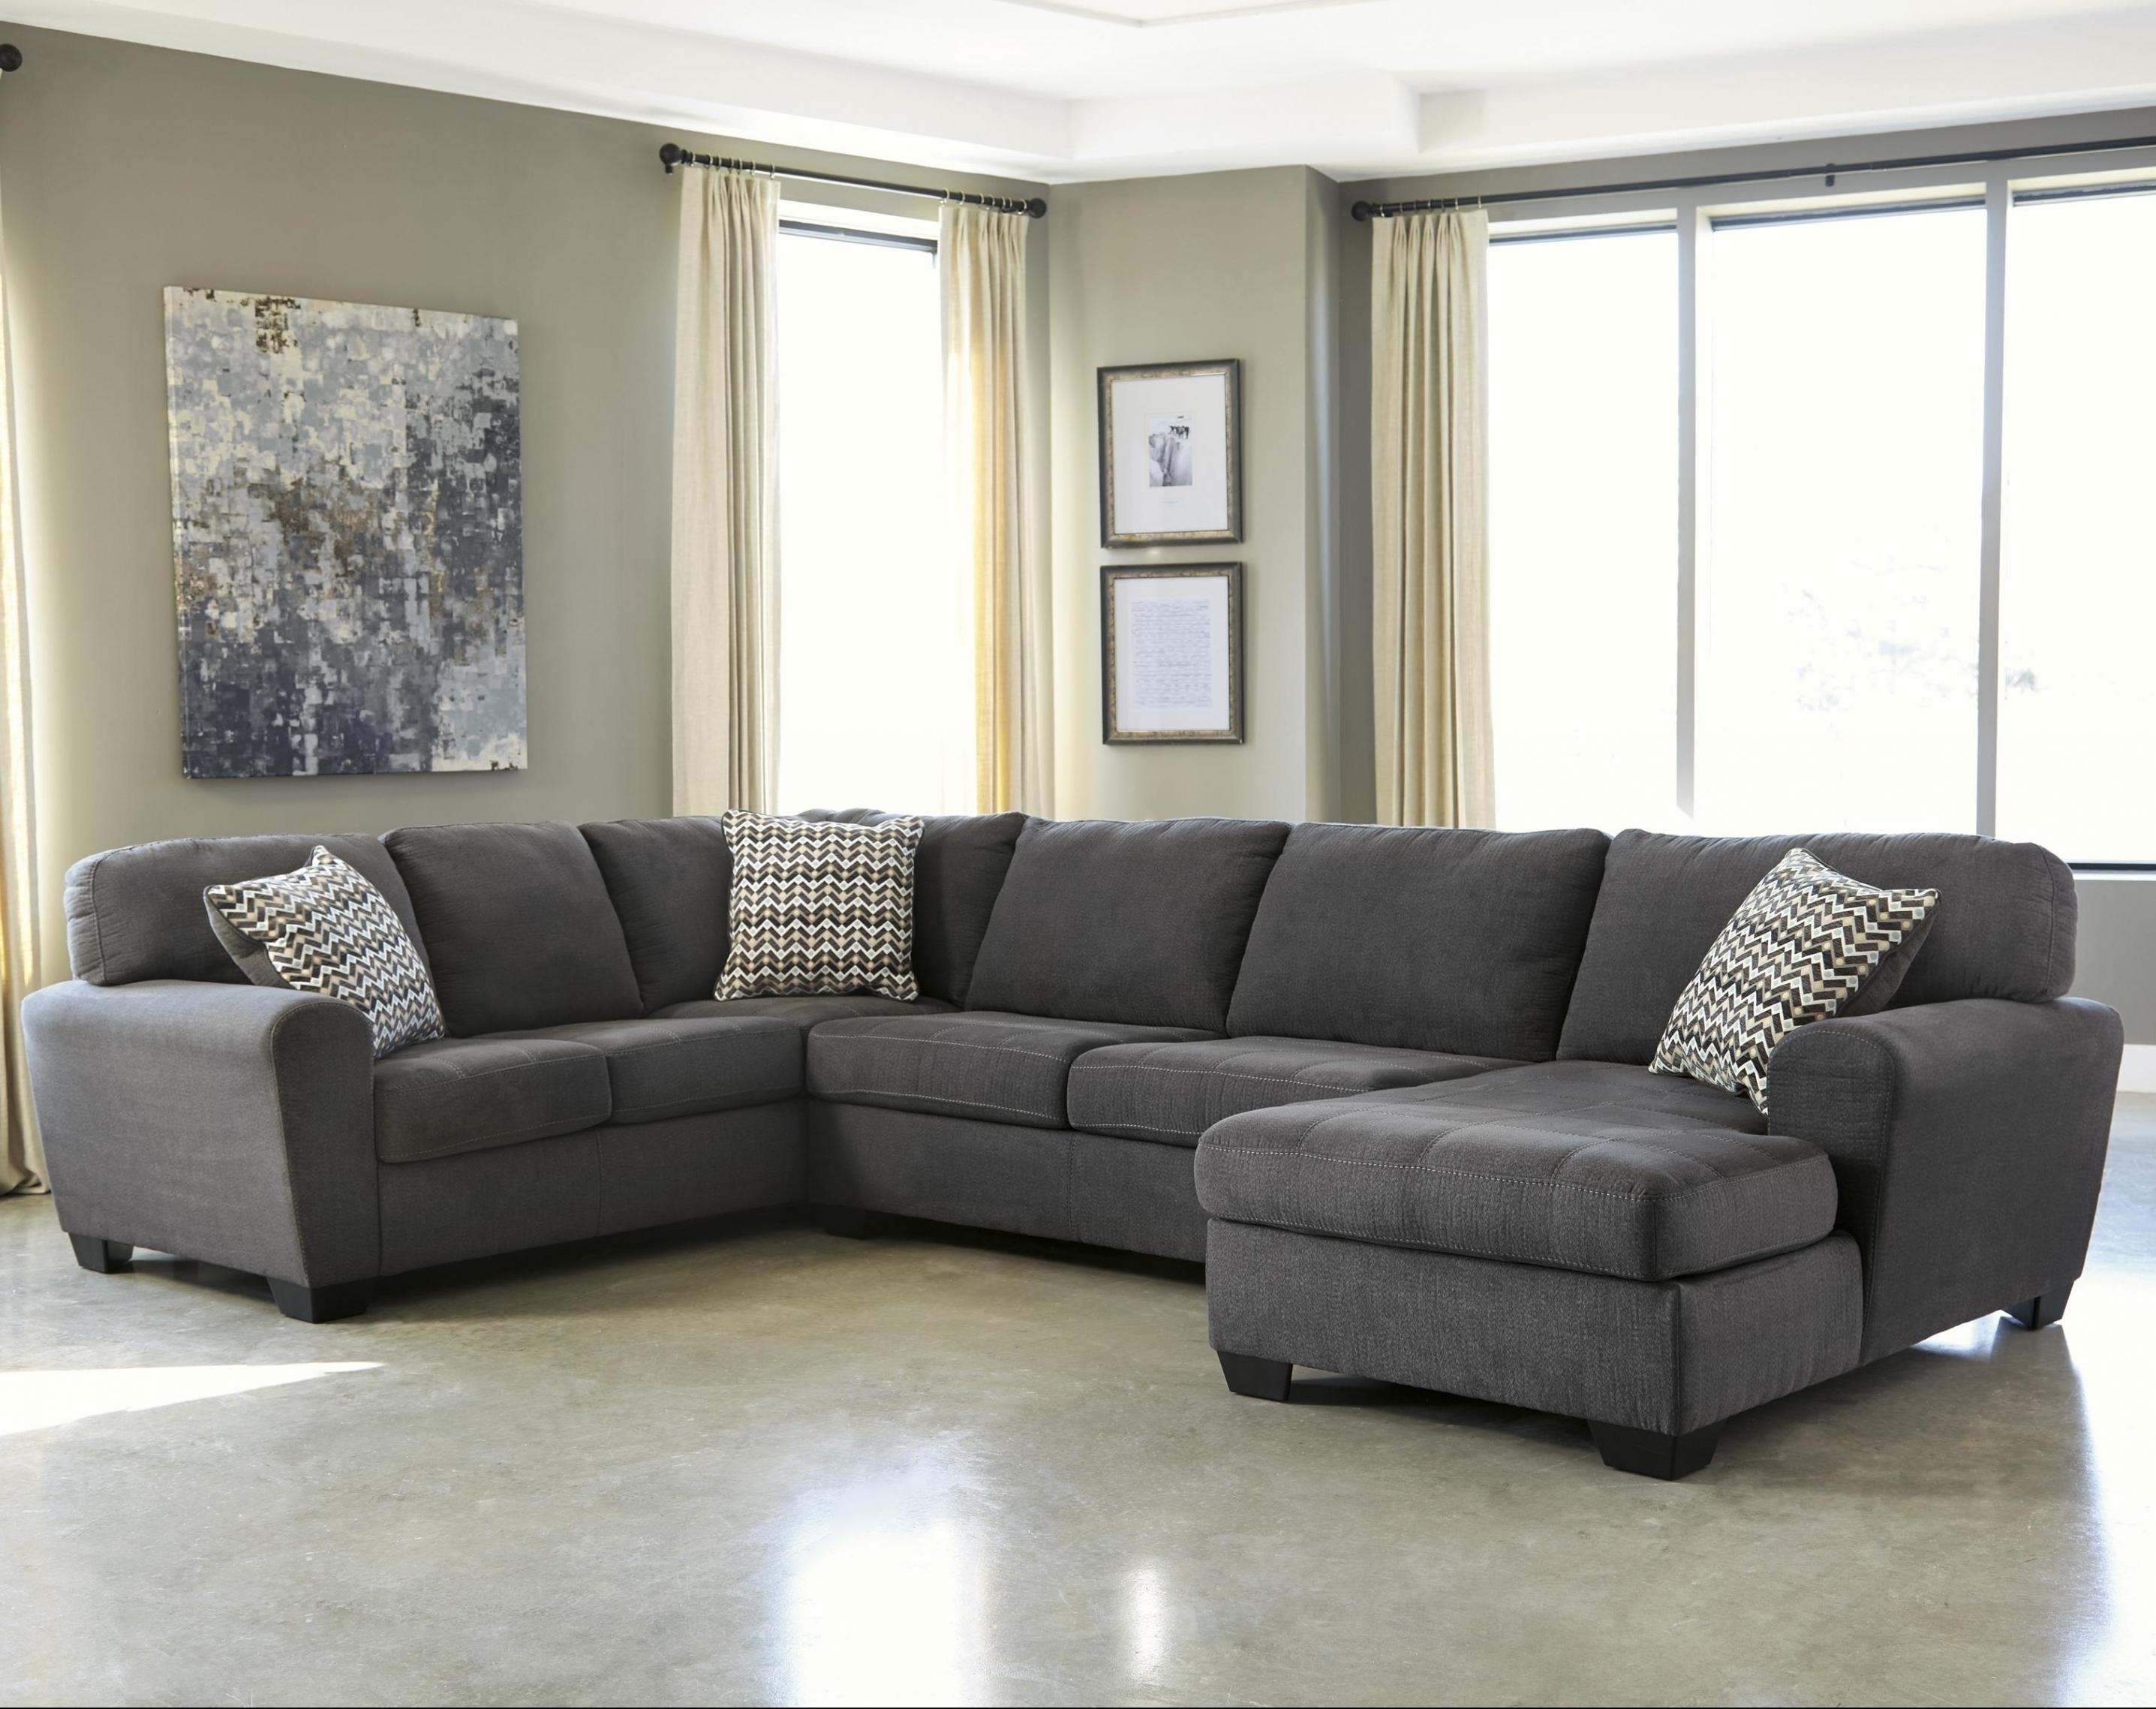 Clubanfi Regarding Luxury Sectional Sofas (View 17 of 20)